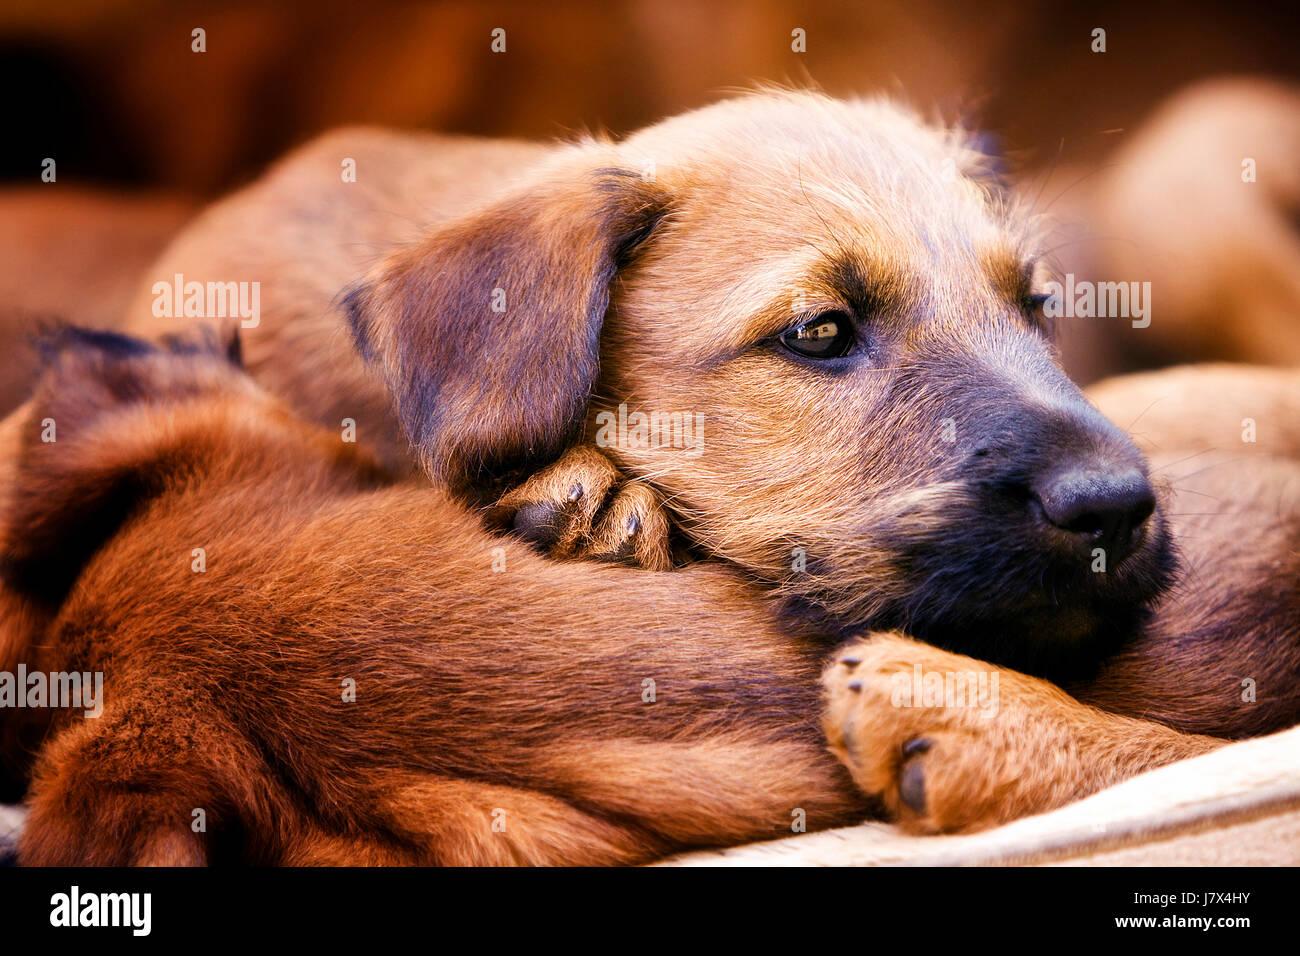 dog sleep sleeping puppy terrier breed cute puppies whelps pupies